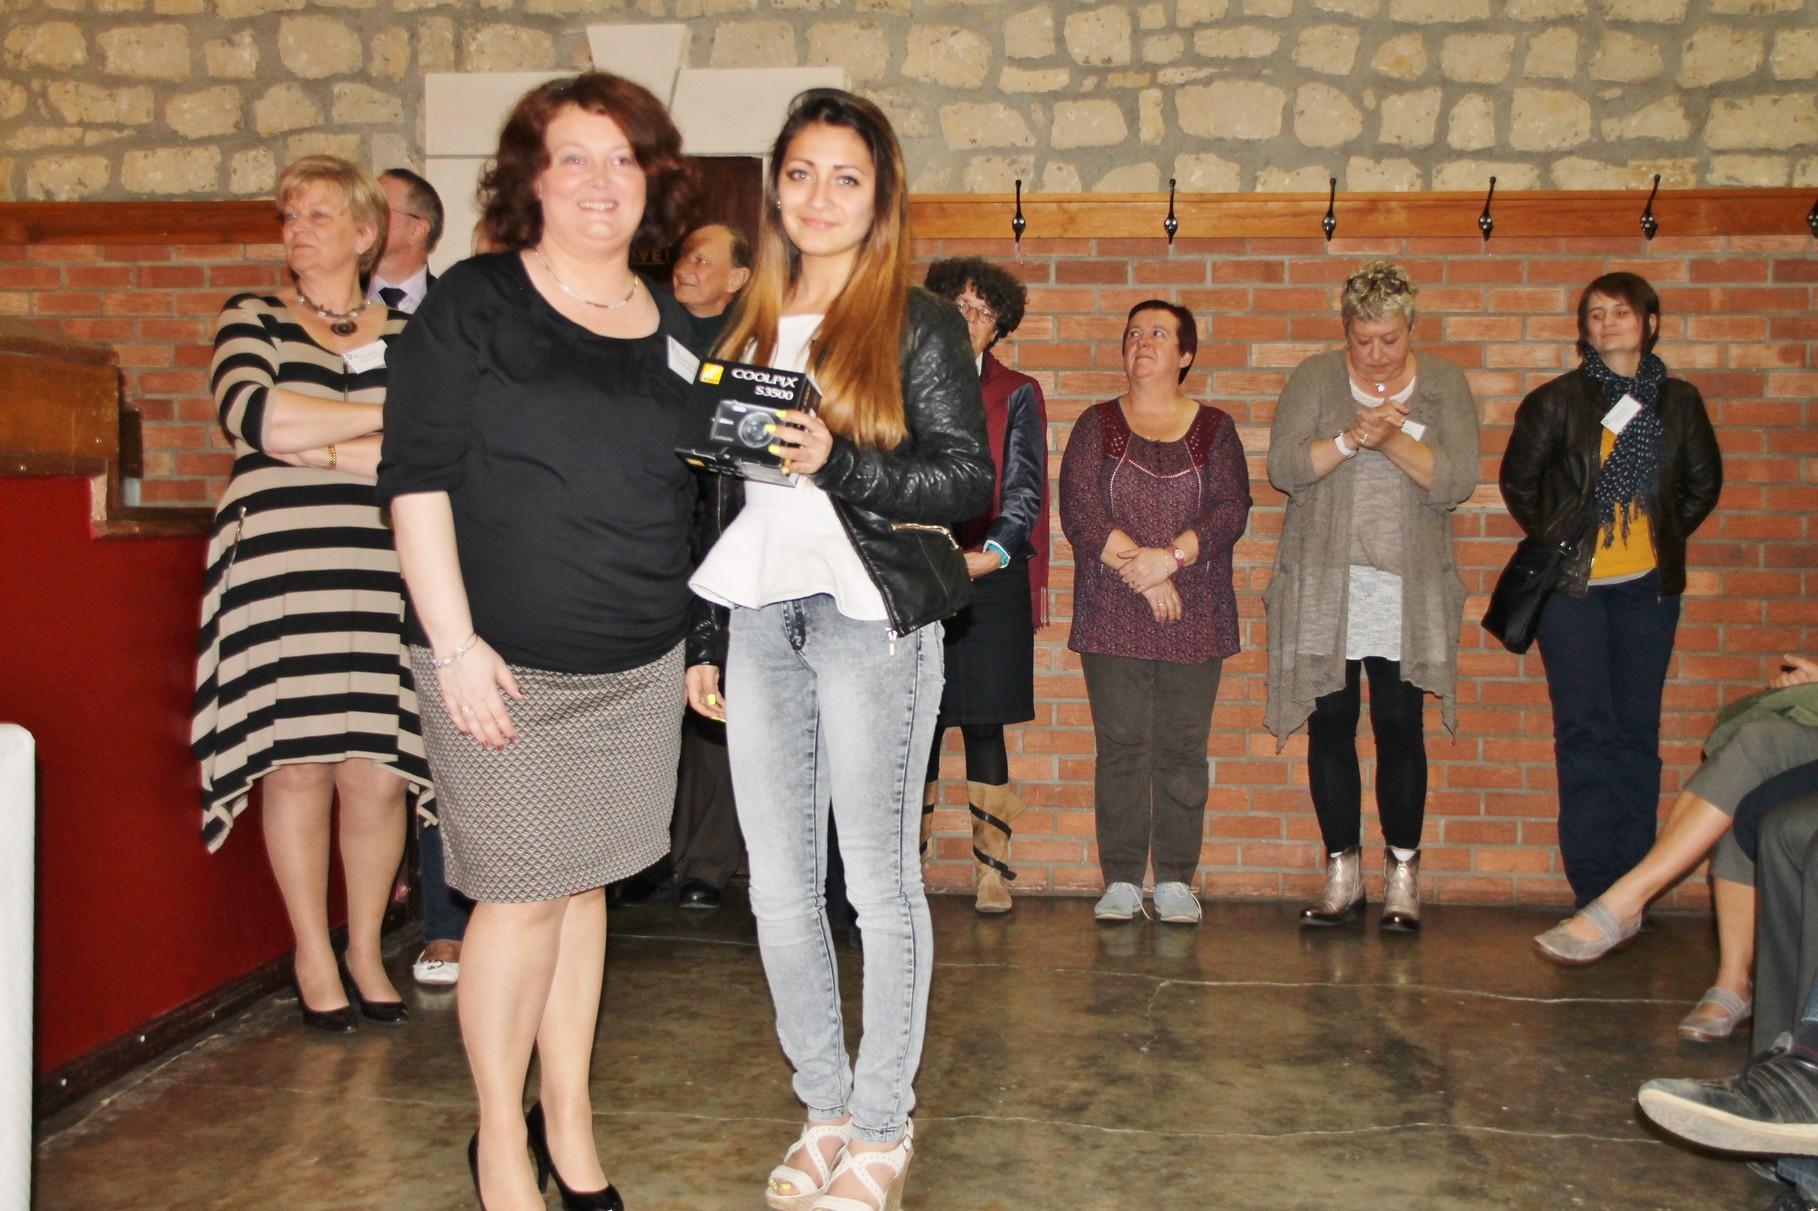 Isabella Furchy Reyes reçoit le 3ème prix remis par Christine Poncelet-Geimer